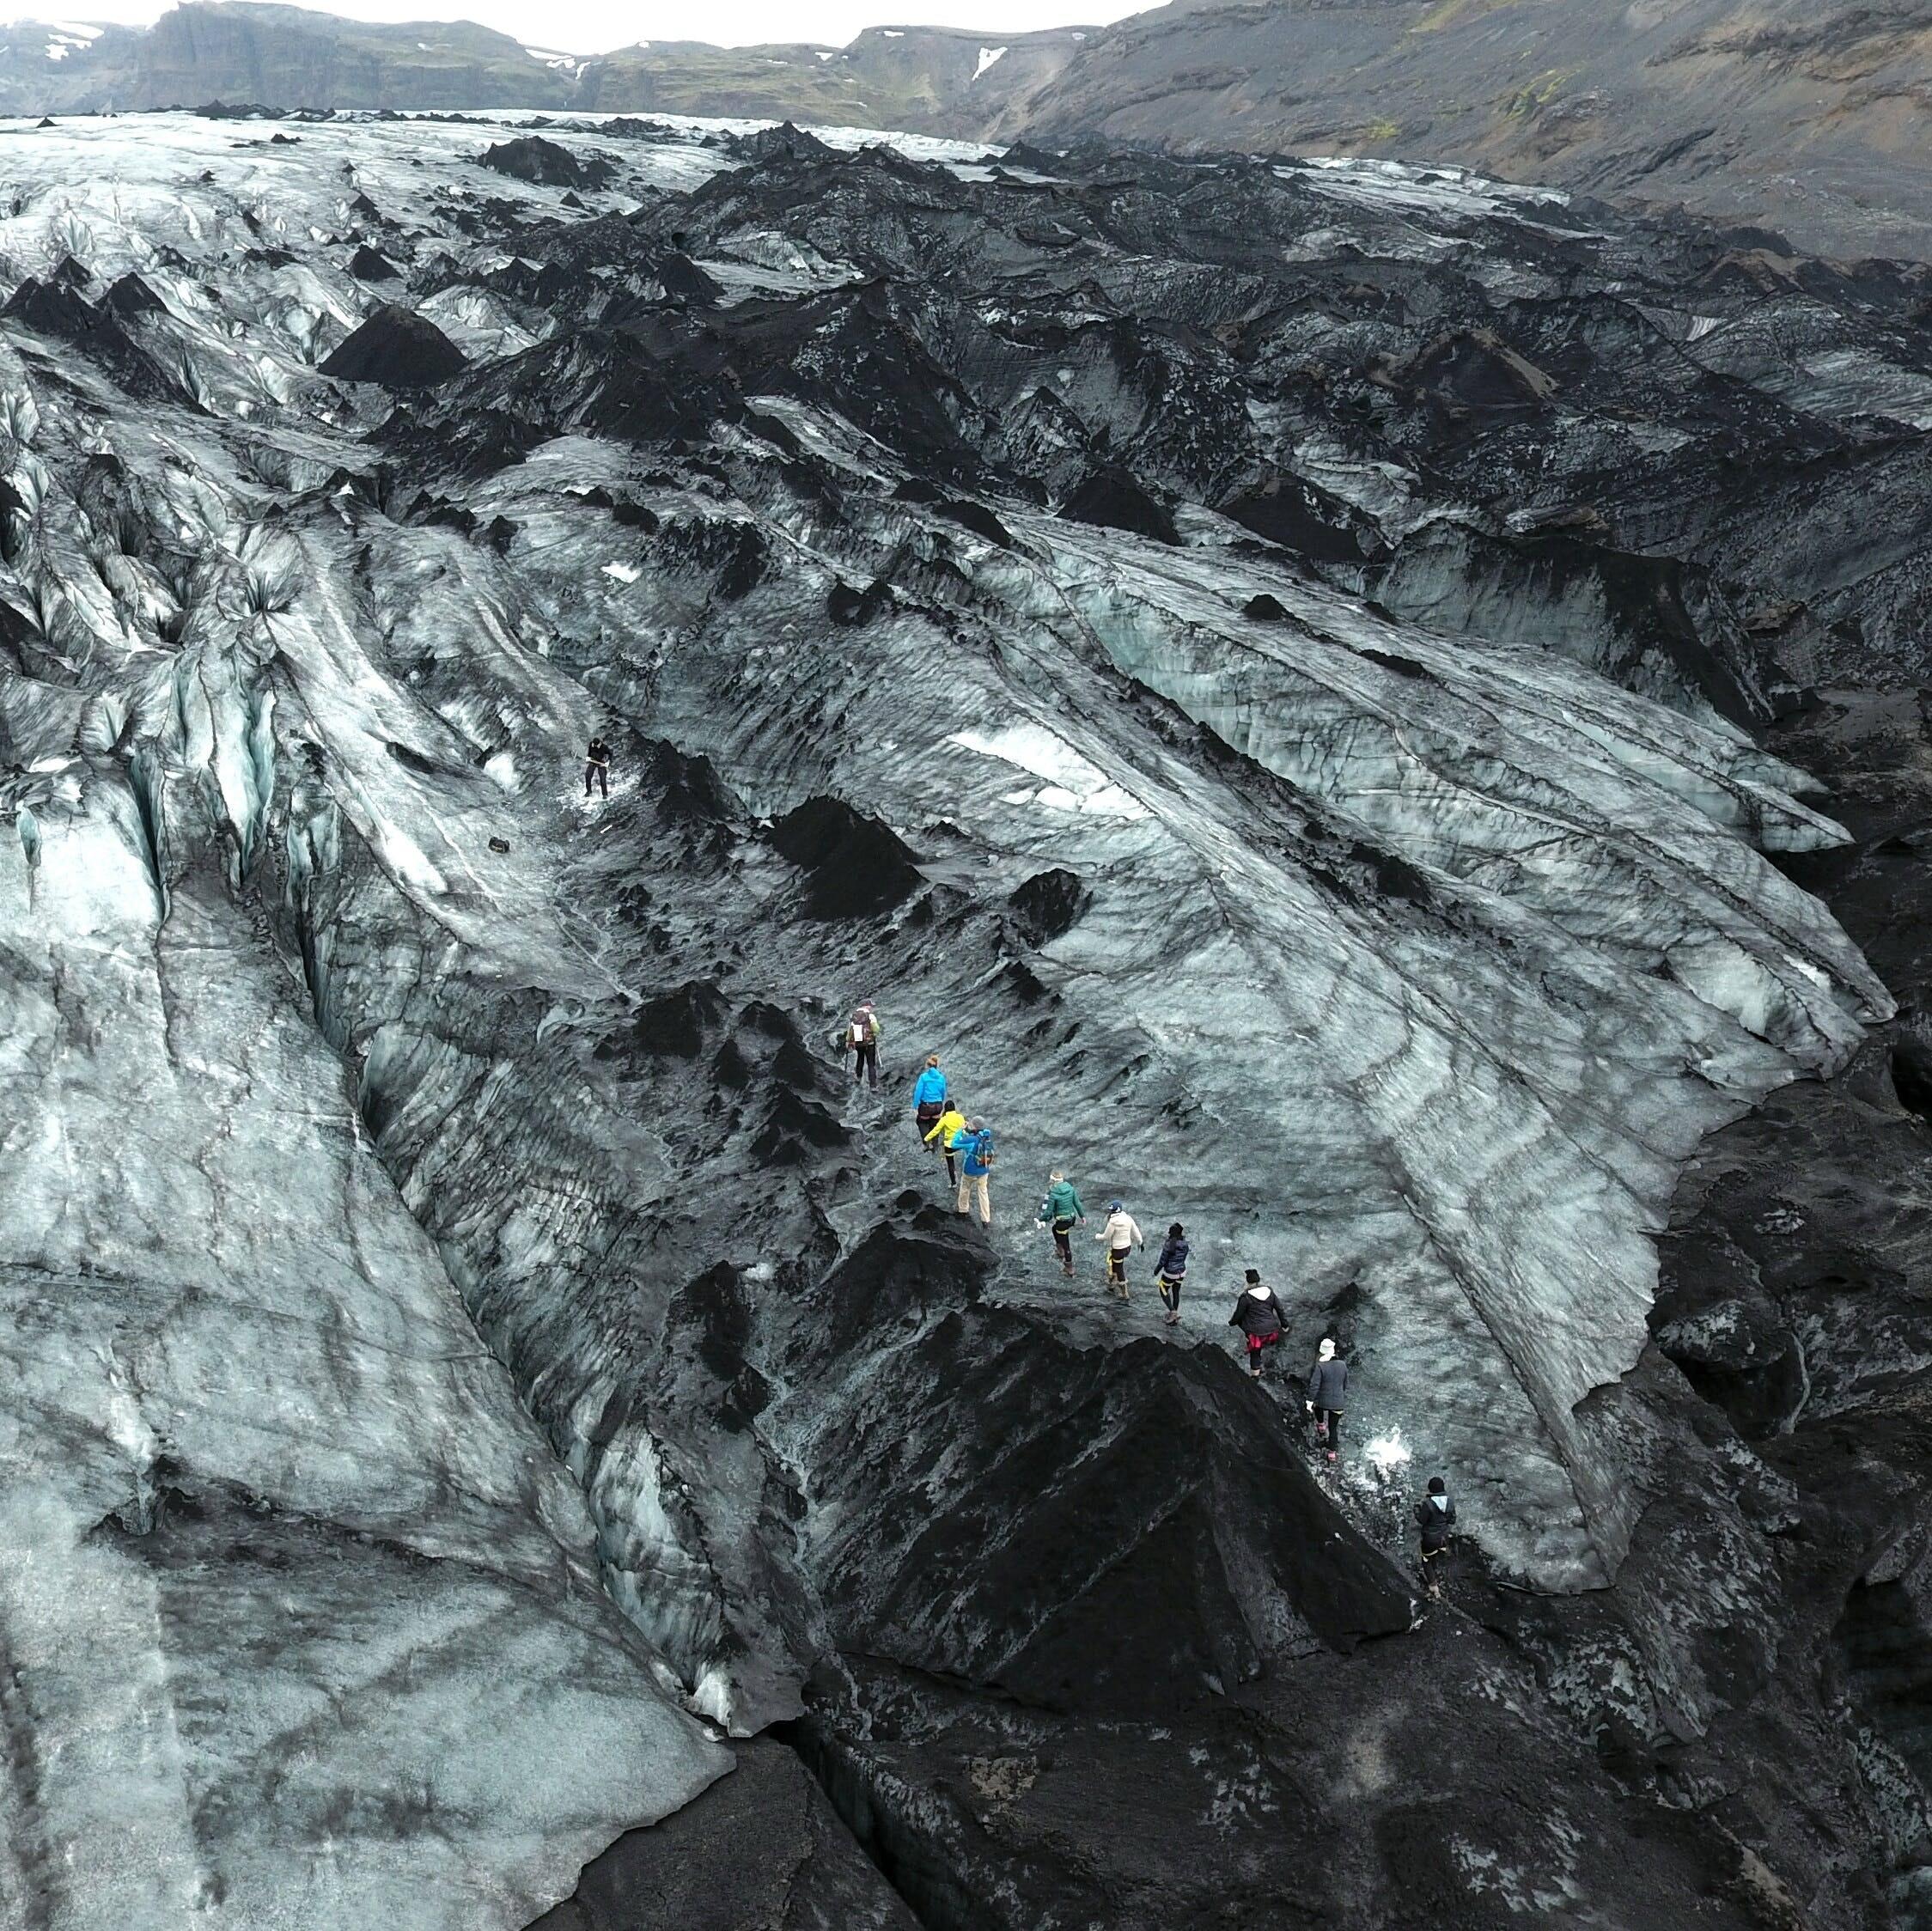 glaciers-and-glacier-hiking-in-iceland-15.jpg